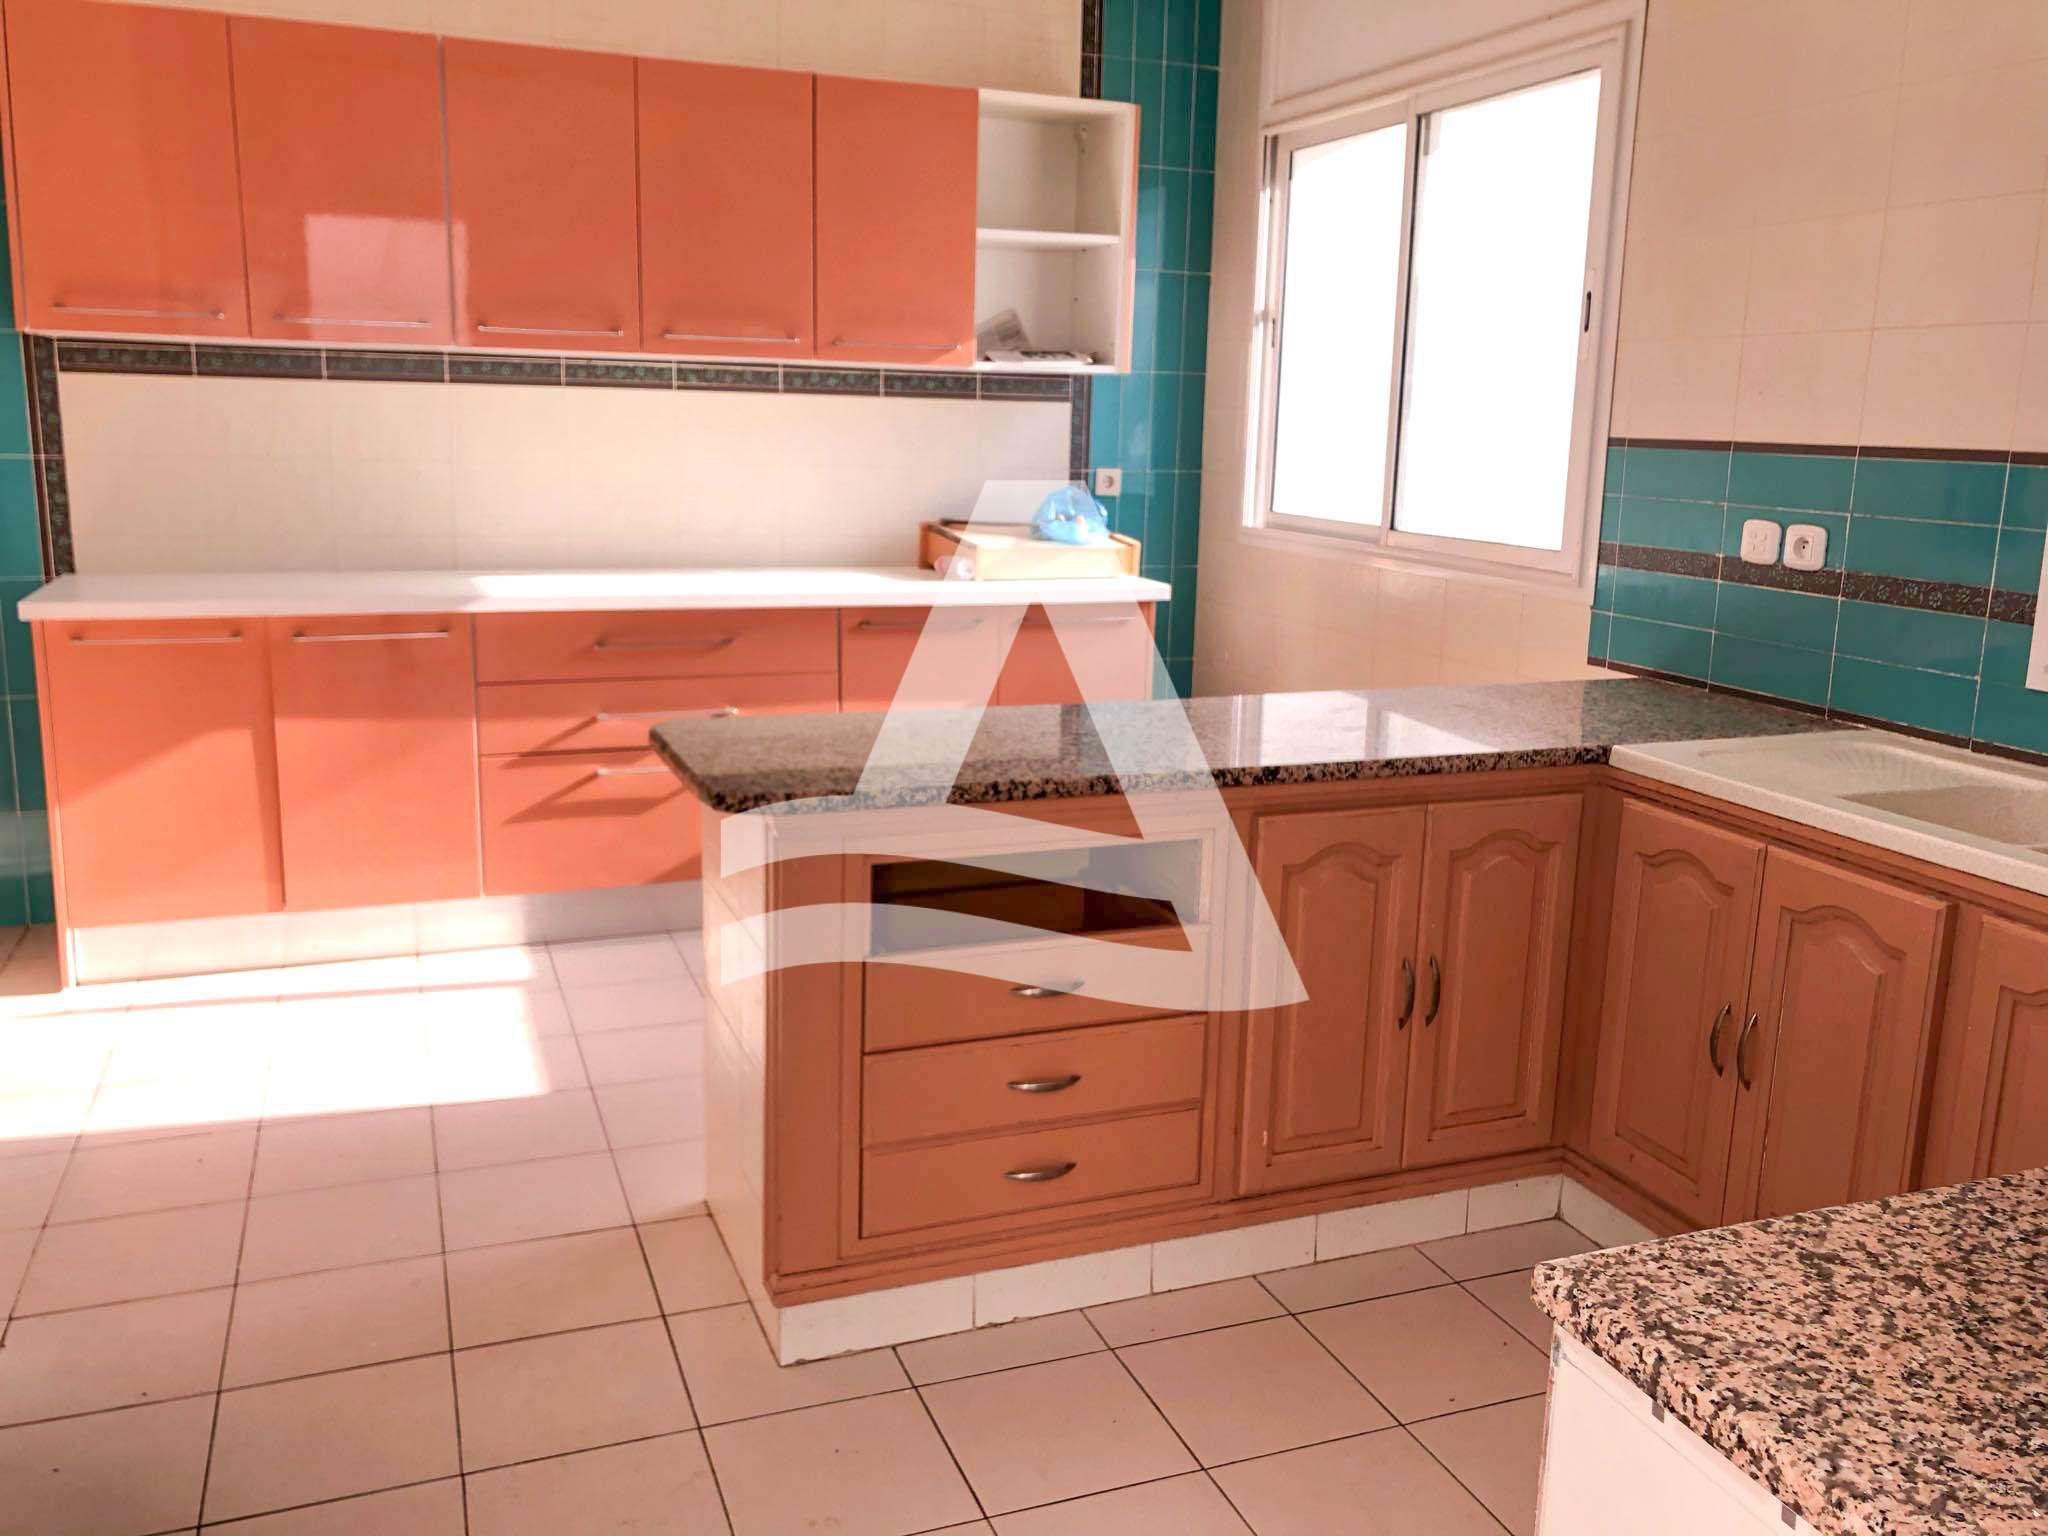 httpss3.amazonaws.comlogimoaws12123522641606832387appartement_jardin_de_carthage_6_sur_12